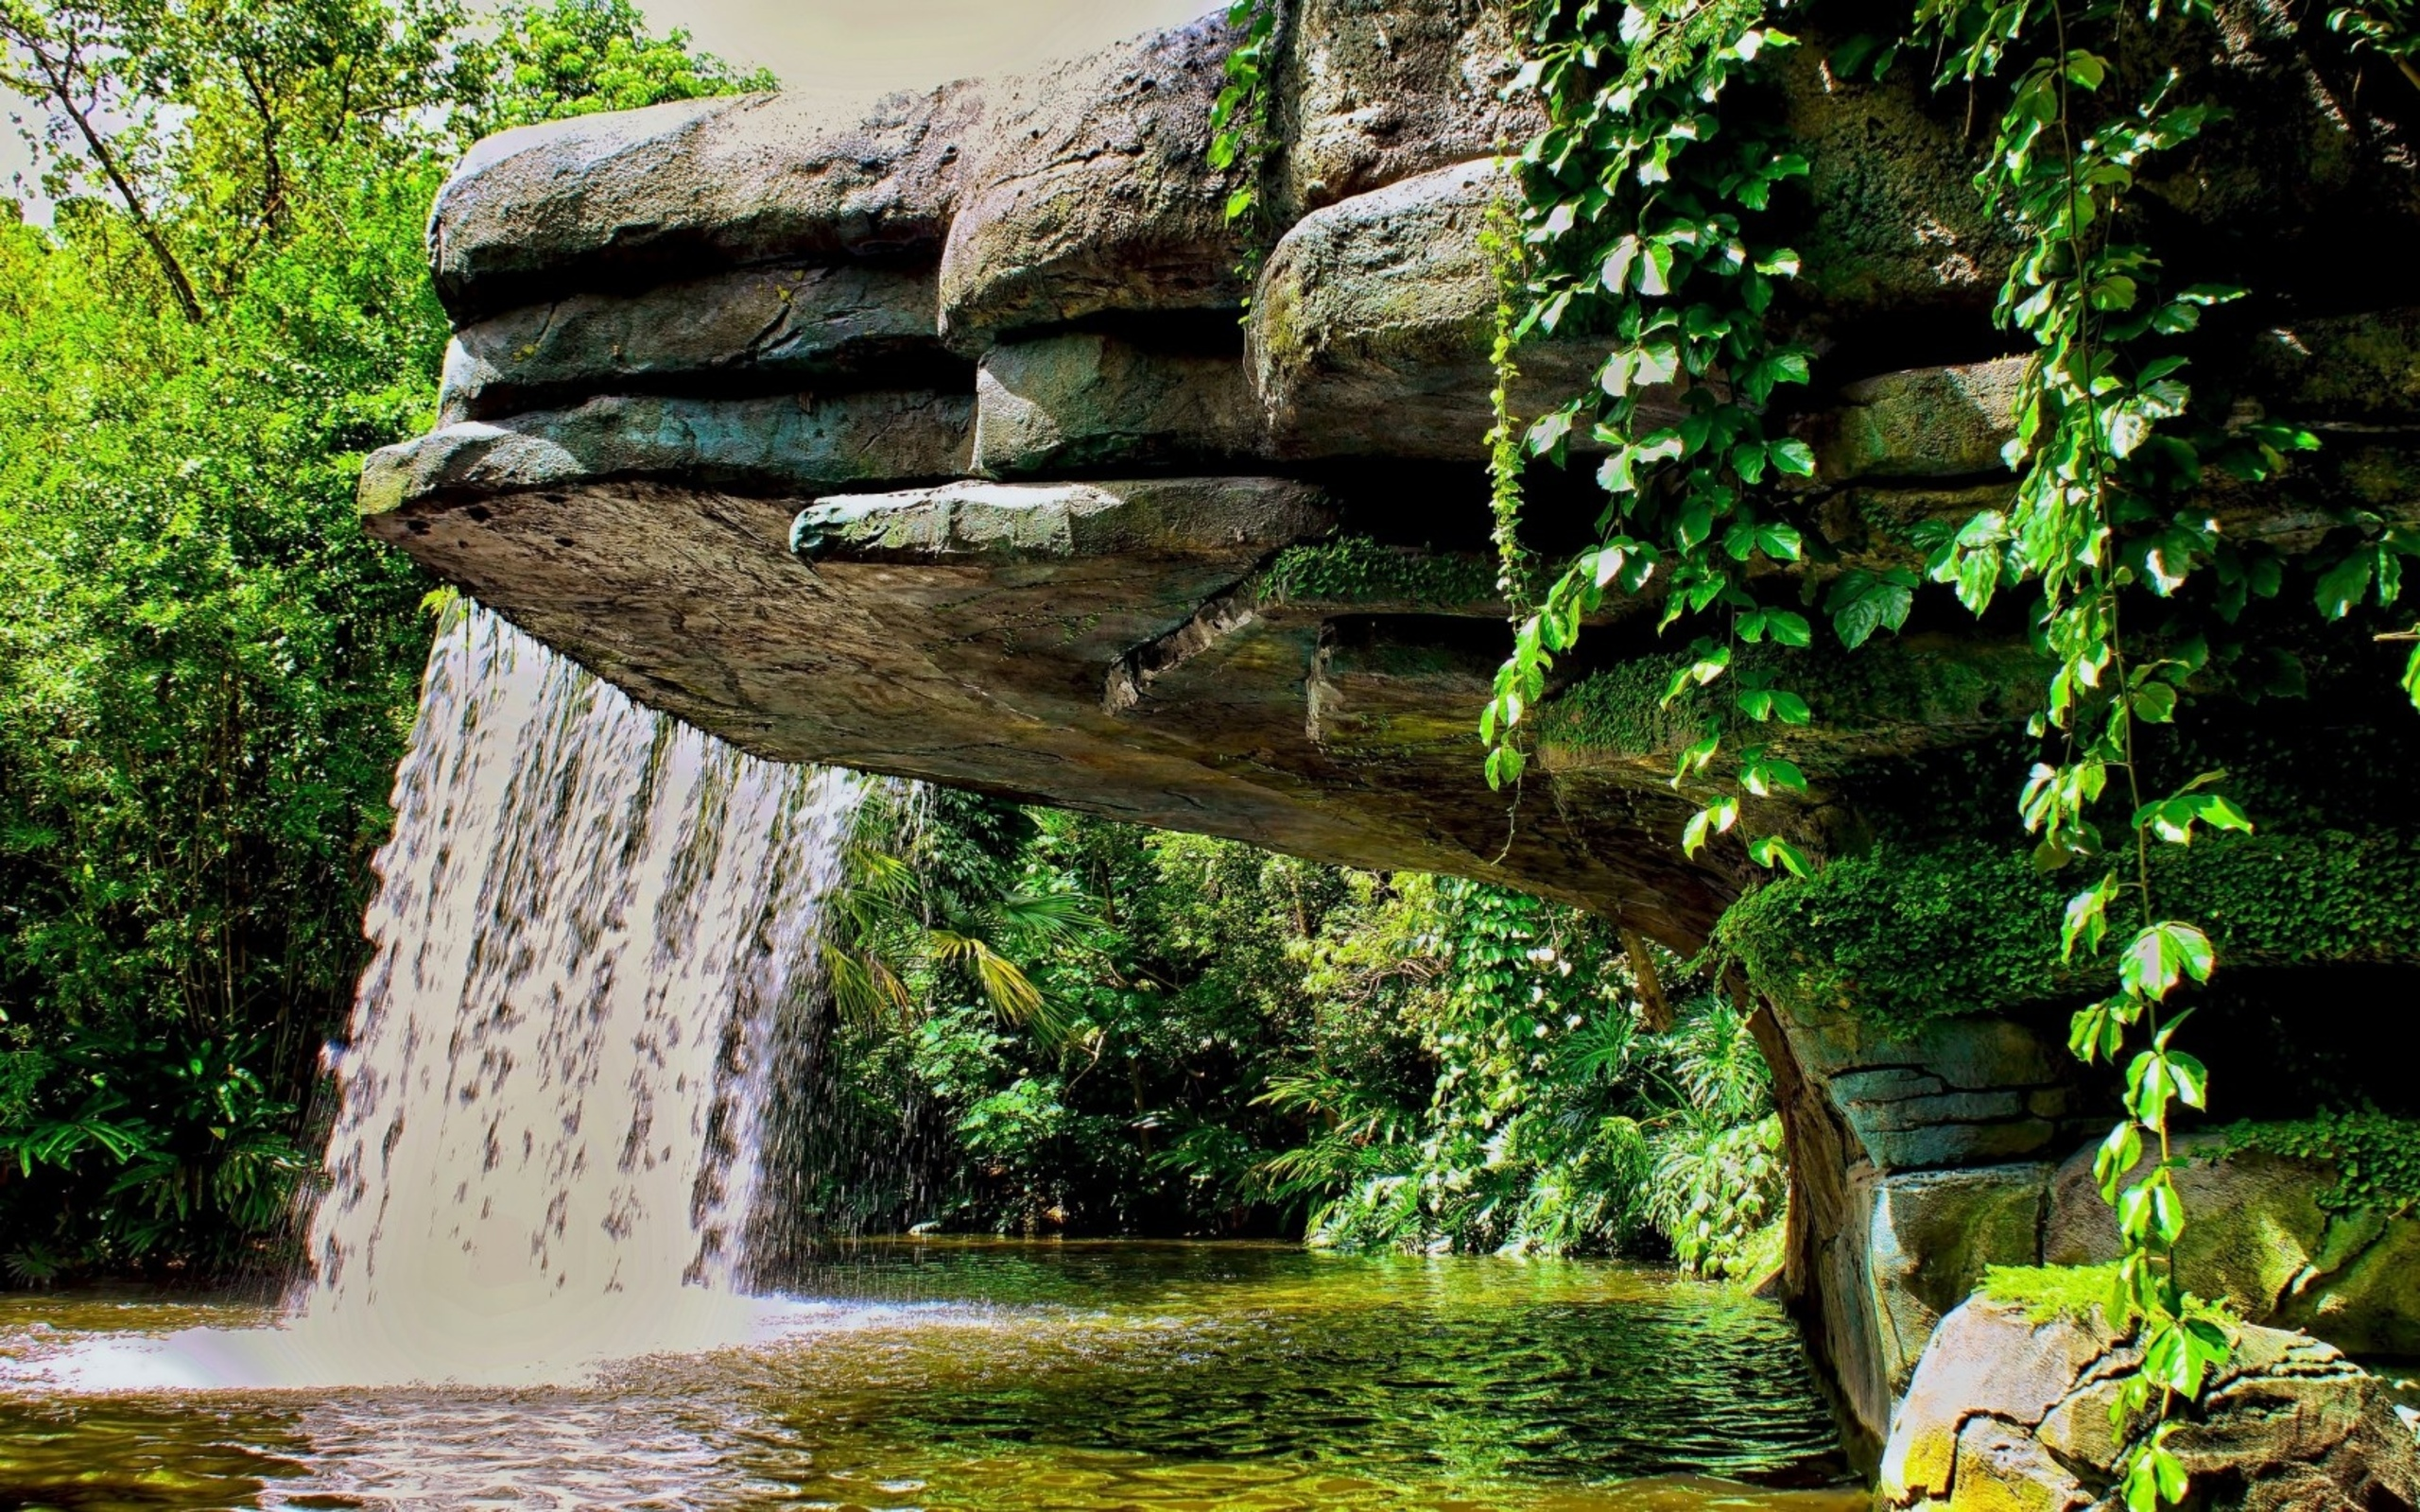 водопад водоем waterfall the pond  № 736723 загрузить